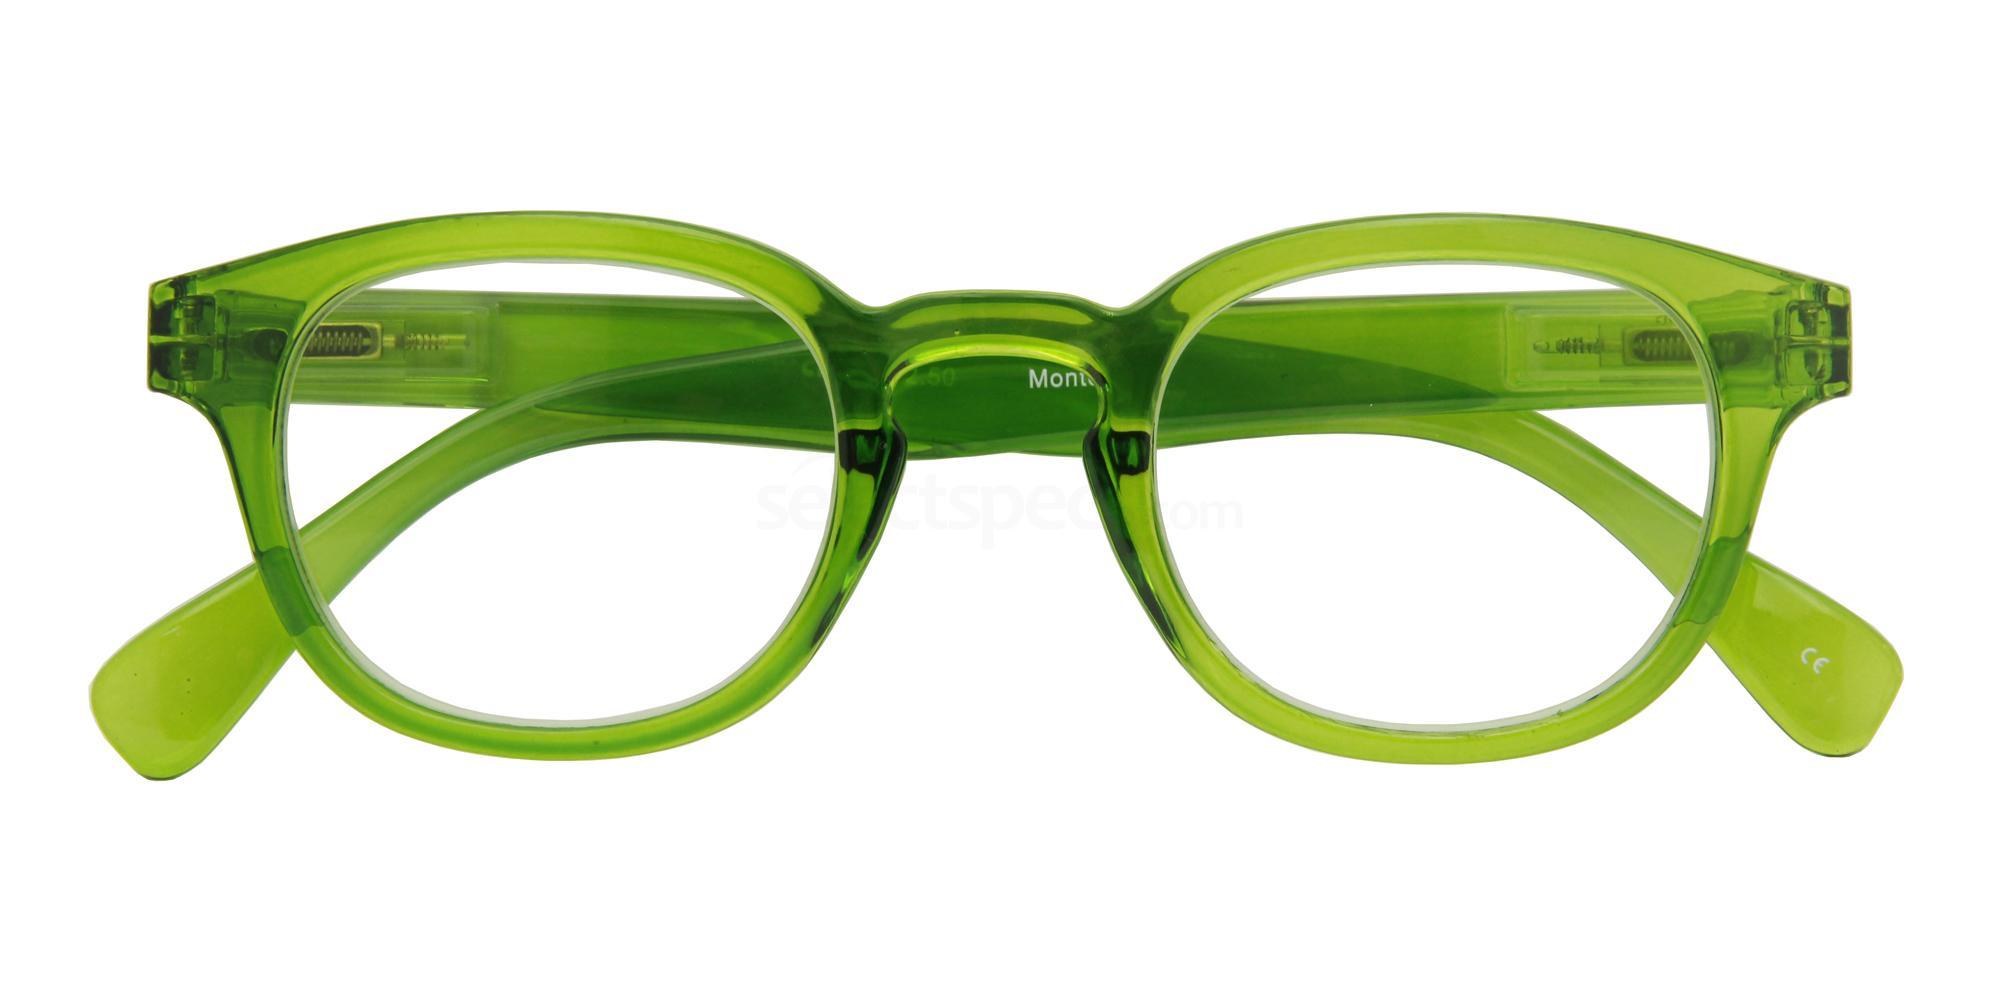 +1.00 Power Montel Green Accessories, Croon